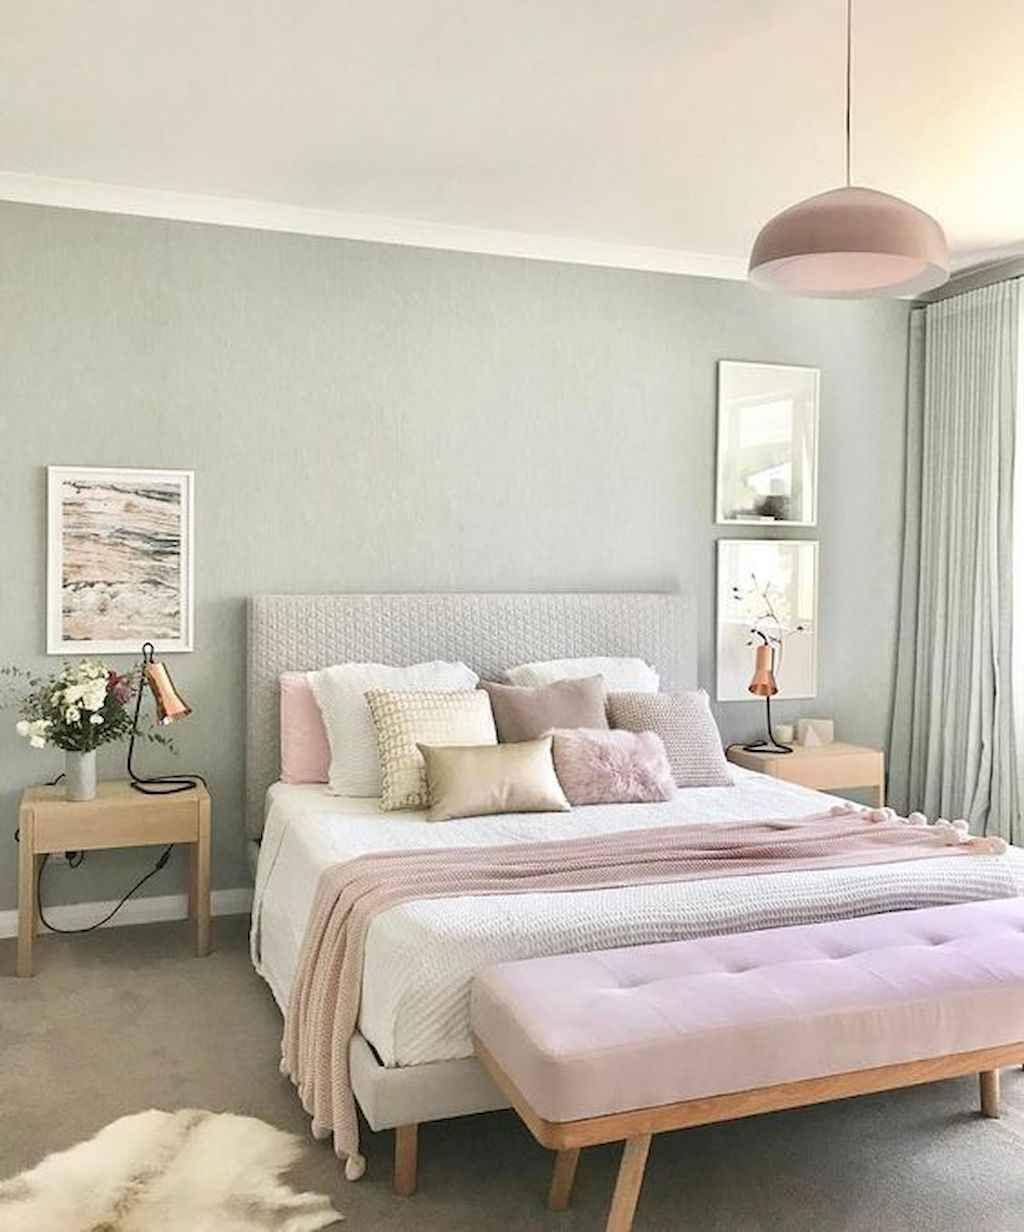 33 stunning examples modern farmhouse master bedroom d cor ideas for rh pinterest com